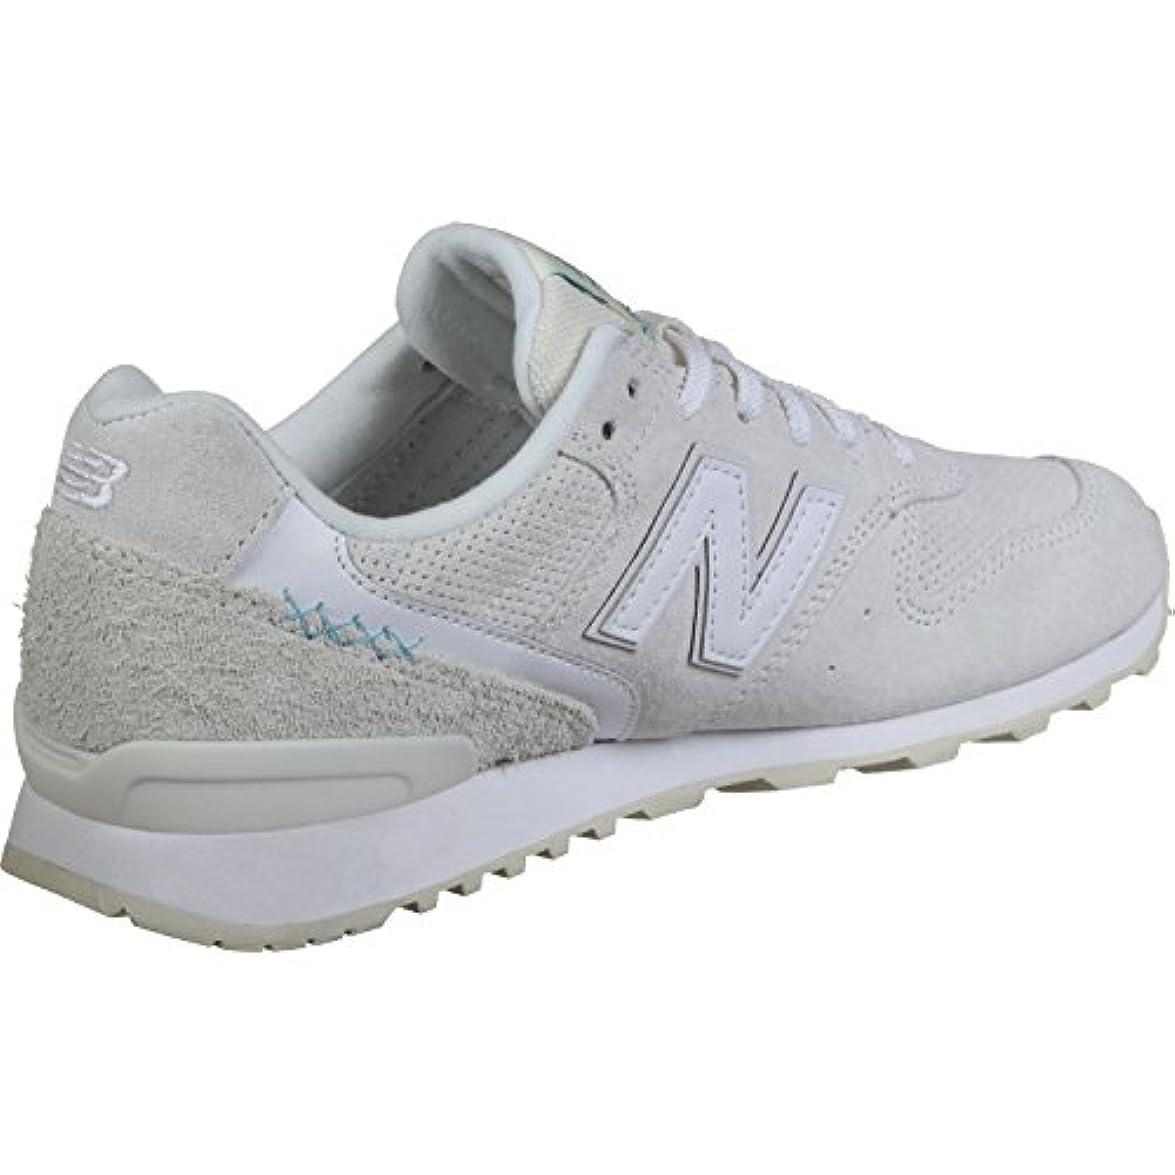 New Balance Wr996 Scarpa White